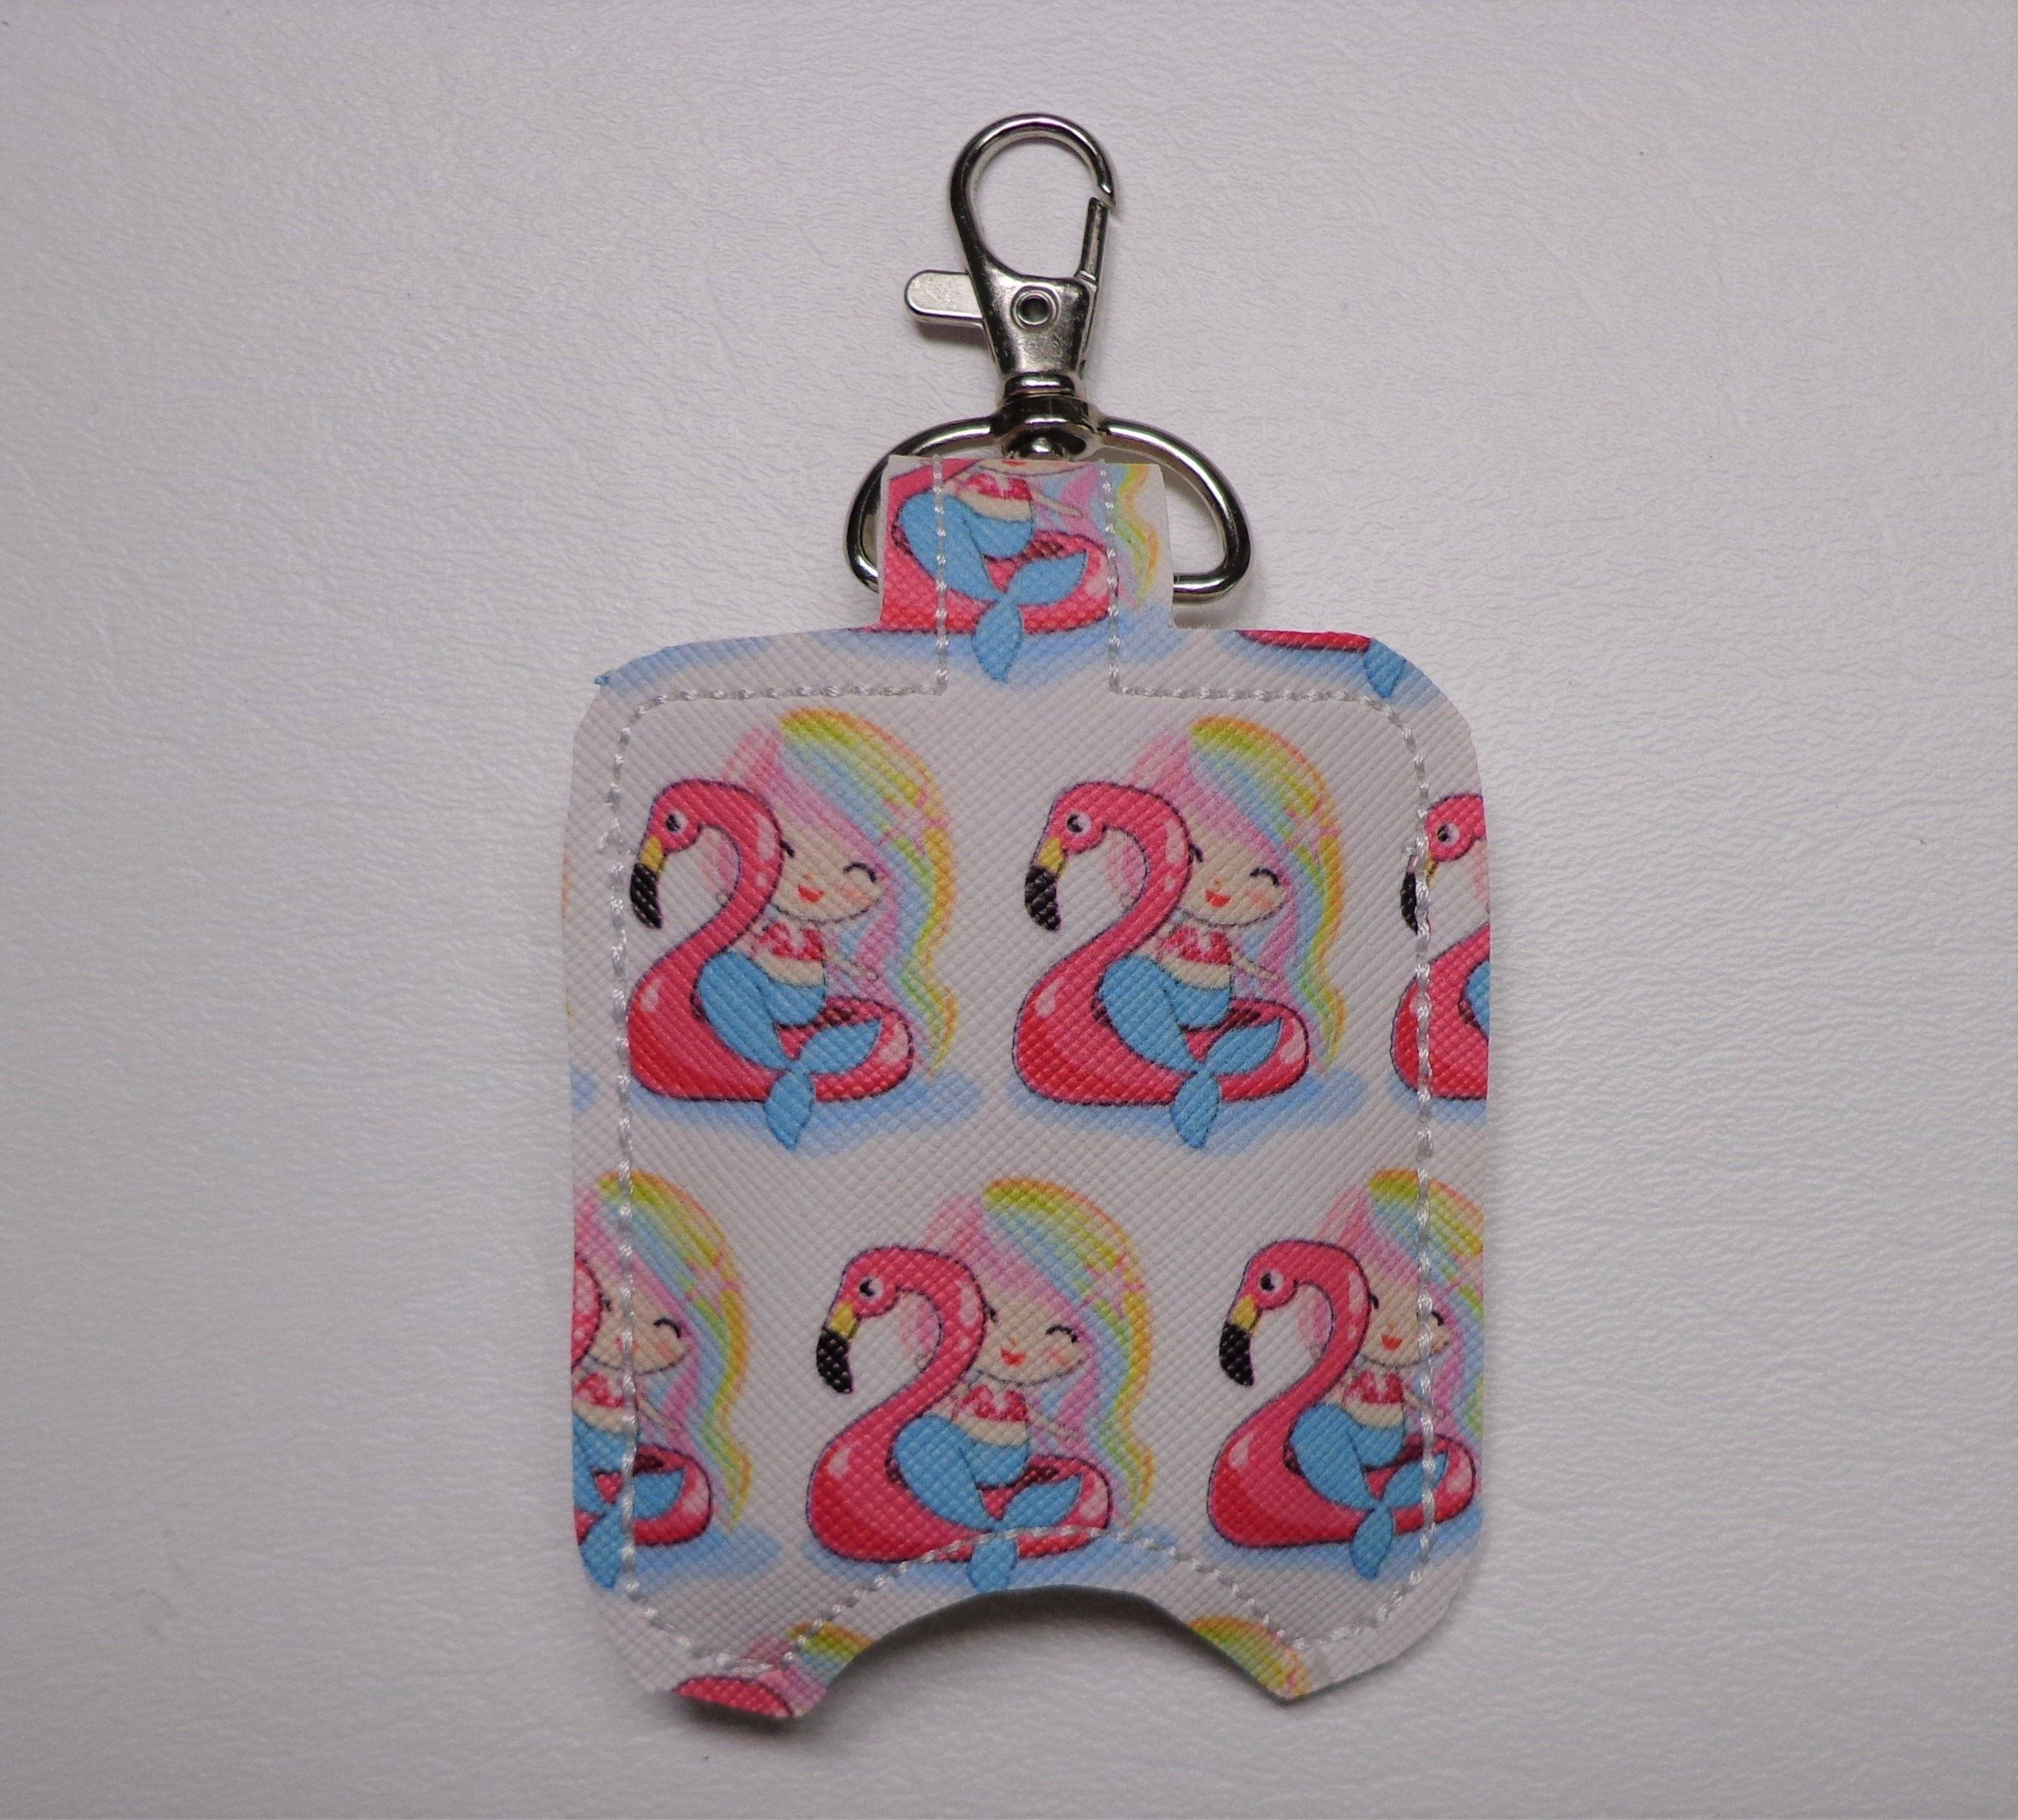 3 Piece Set Nurse Lip Balm Holder Key Chain Tag And Hand